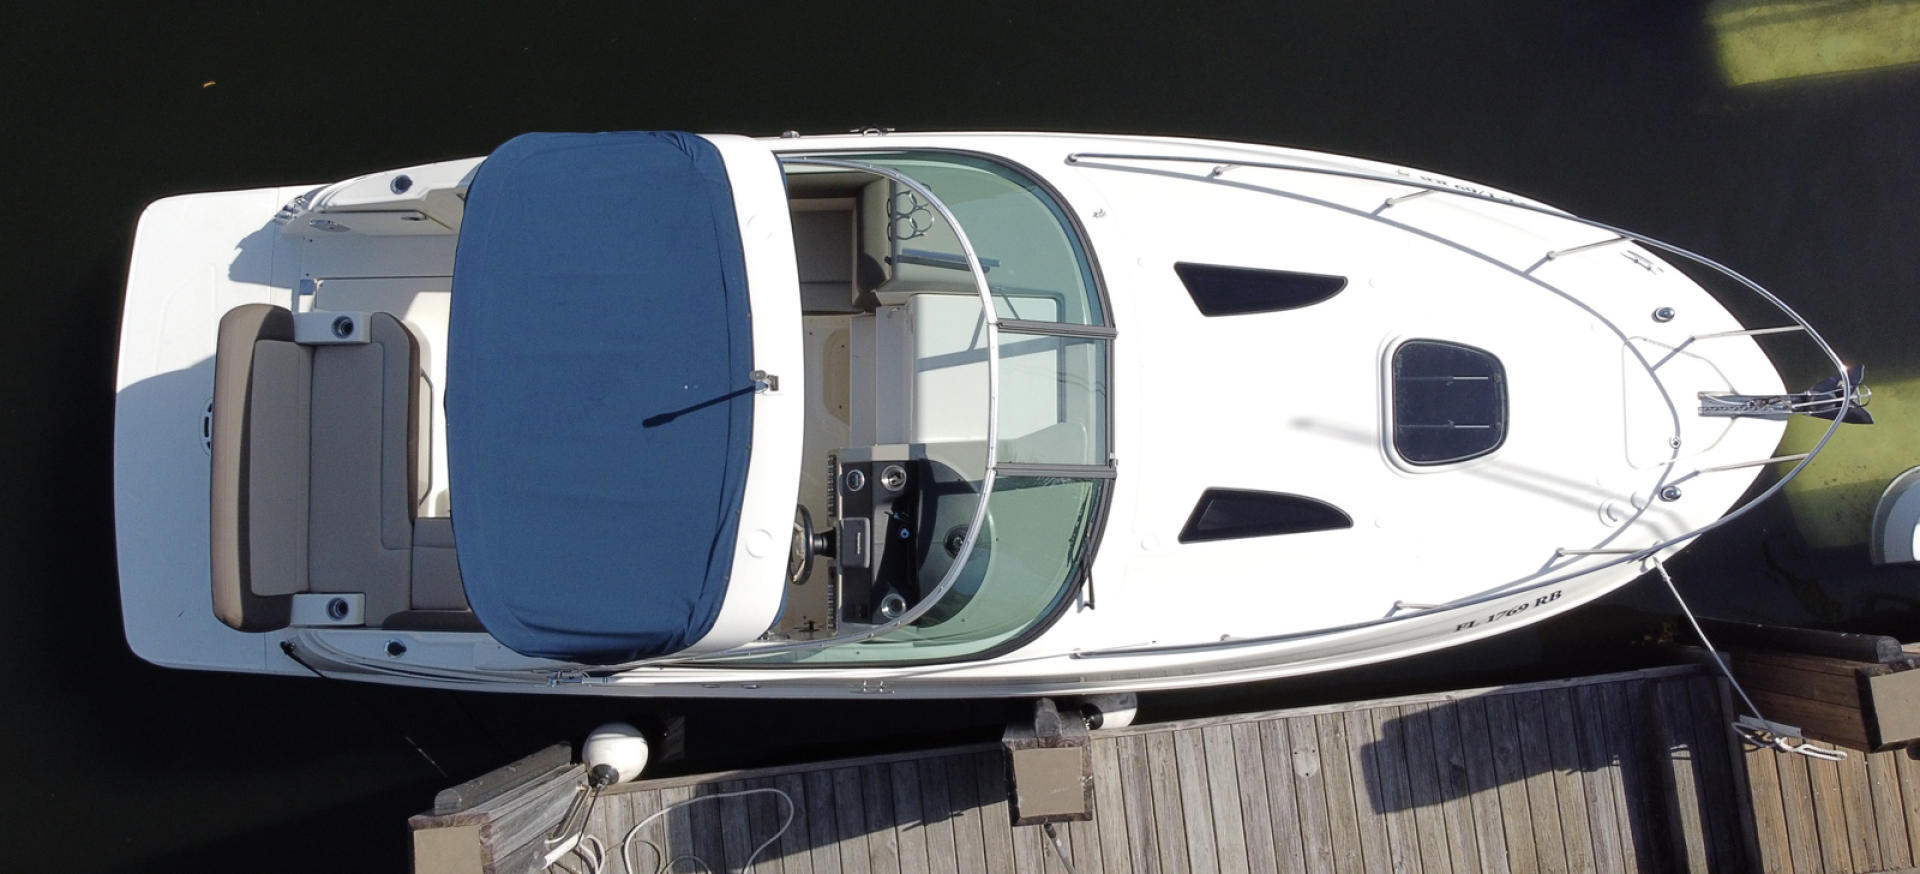 Sea Ray 2015-KREBUS Boca Raton-Florida-United States-Deck layout-1604818 | Thumbnail